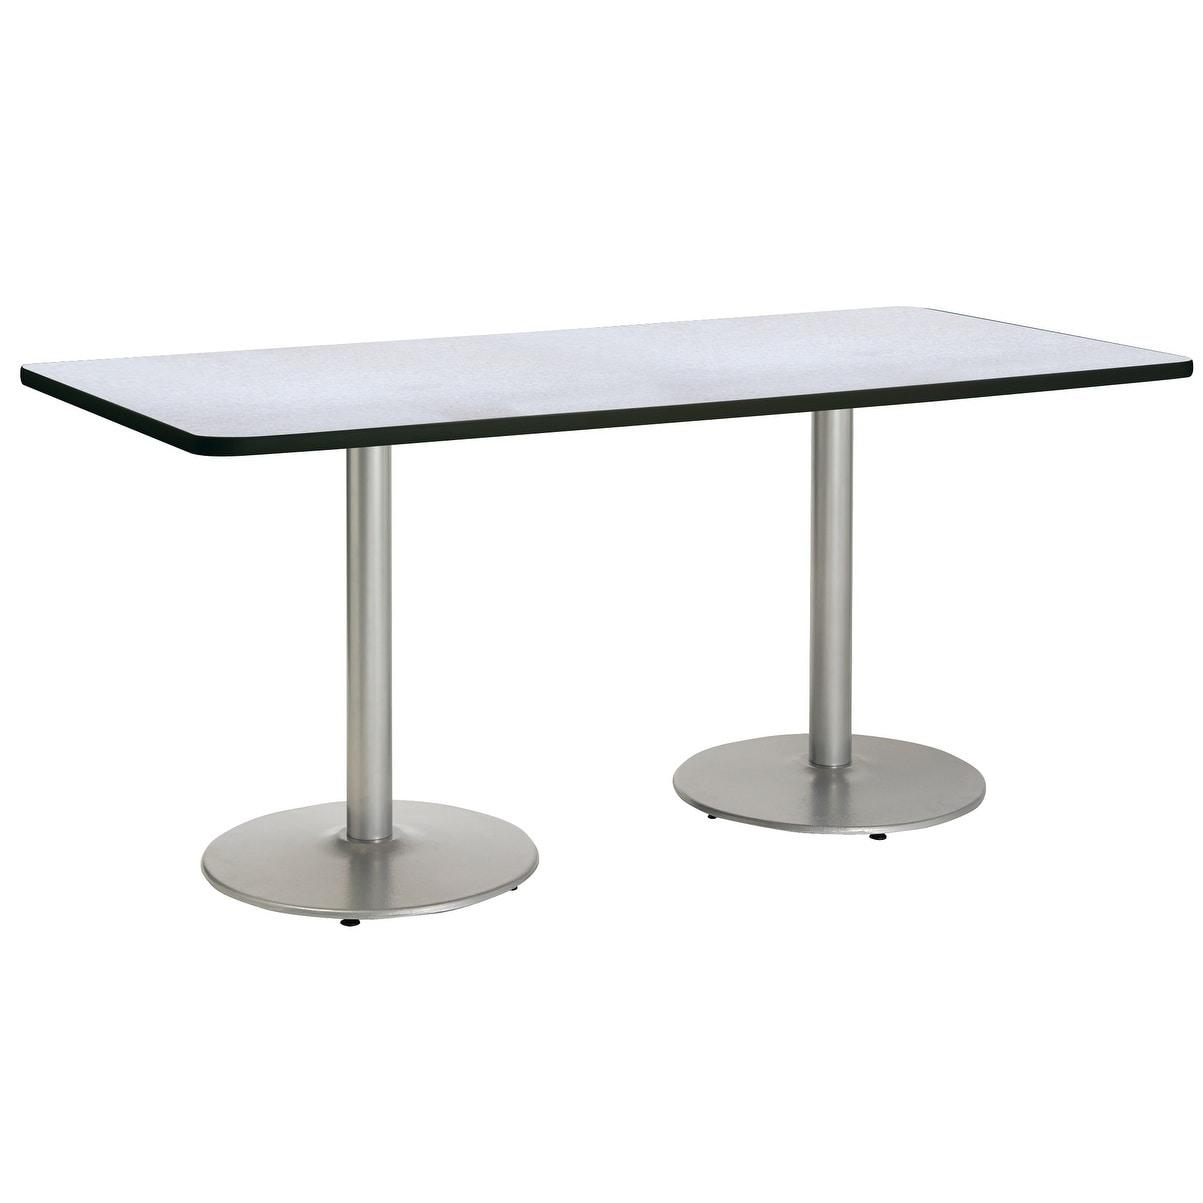 Shop Kfi Mode Multipurpose Table Round Silver Base Standard